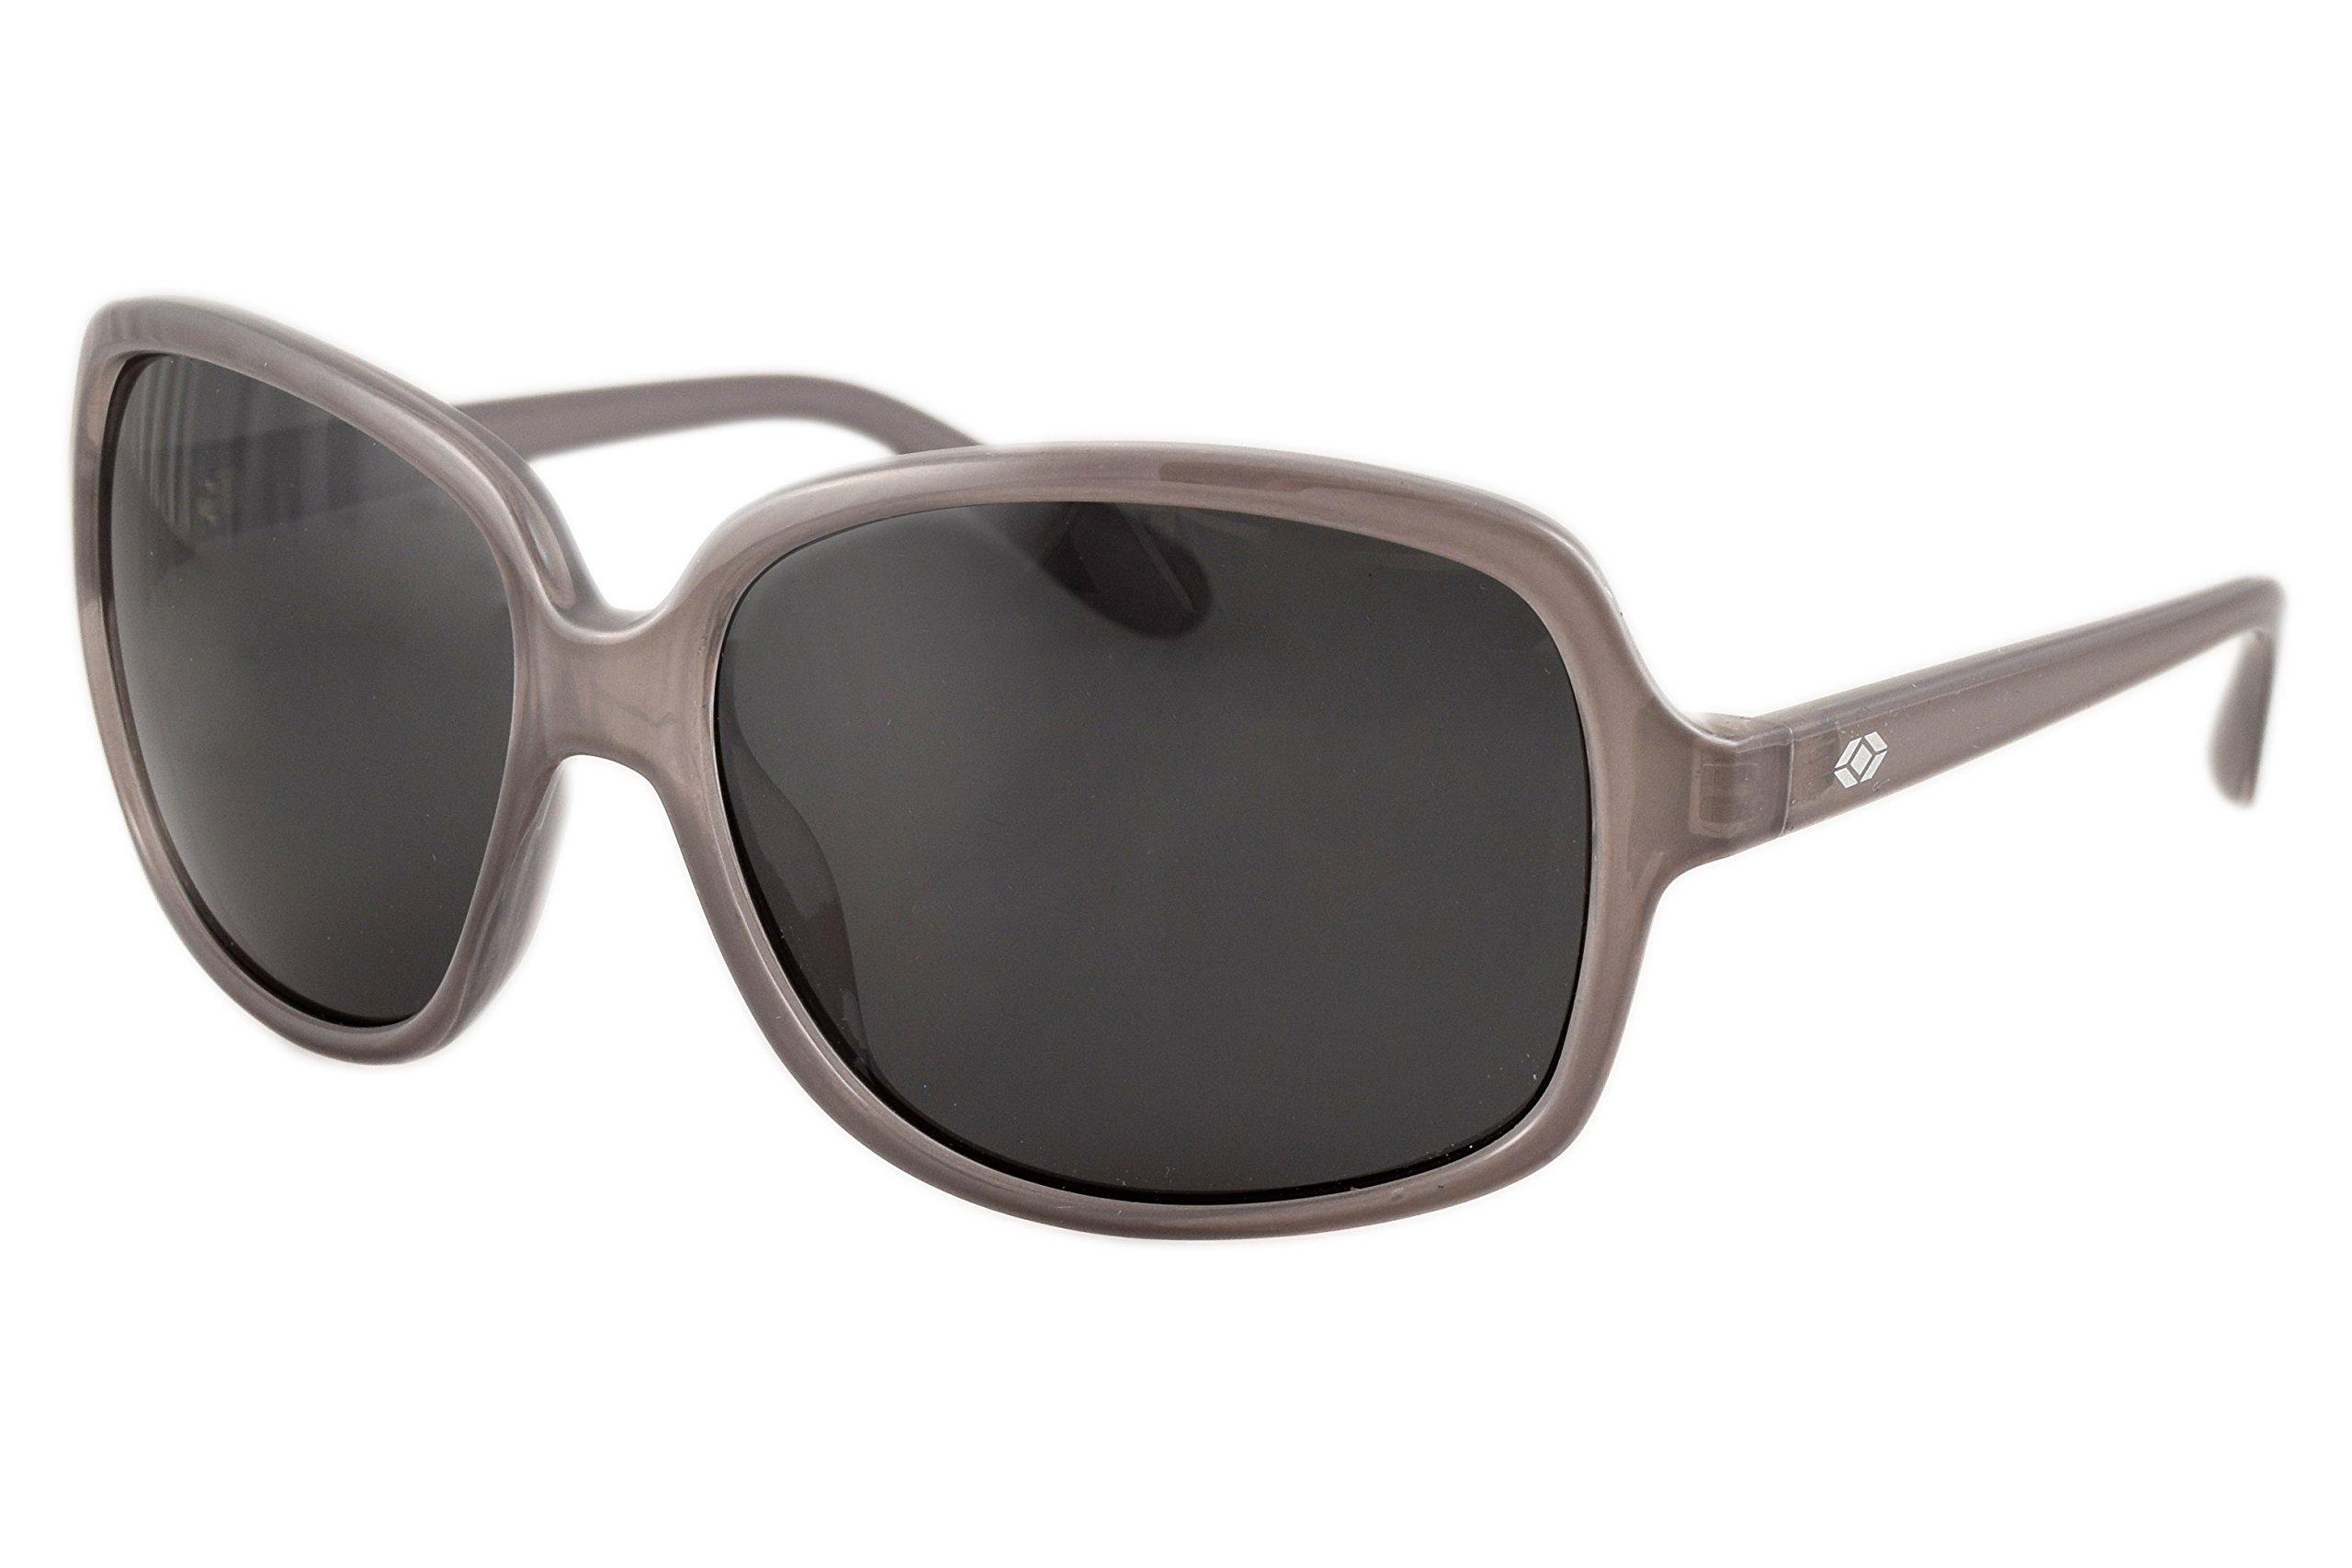 13Fifty Newport Women's Wraparound Fashion Sunglasses, Gray Square Frame, Smoked Polarized UV Protection